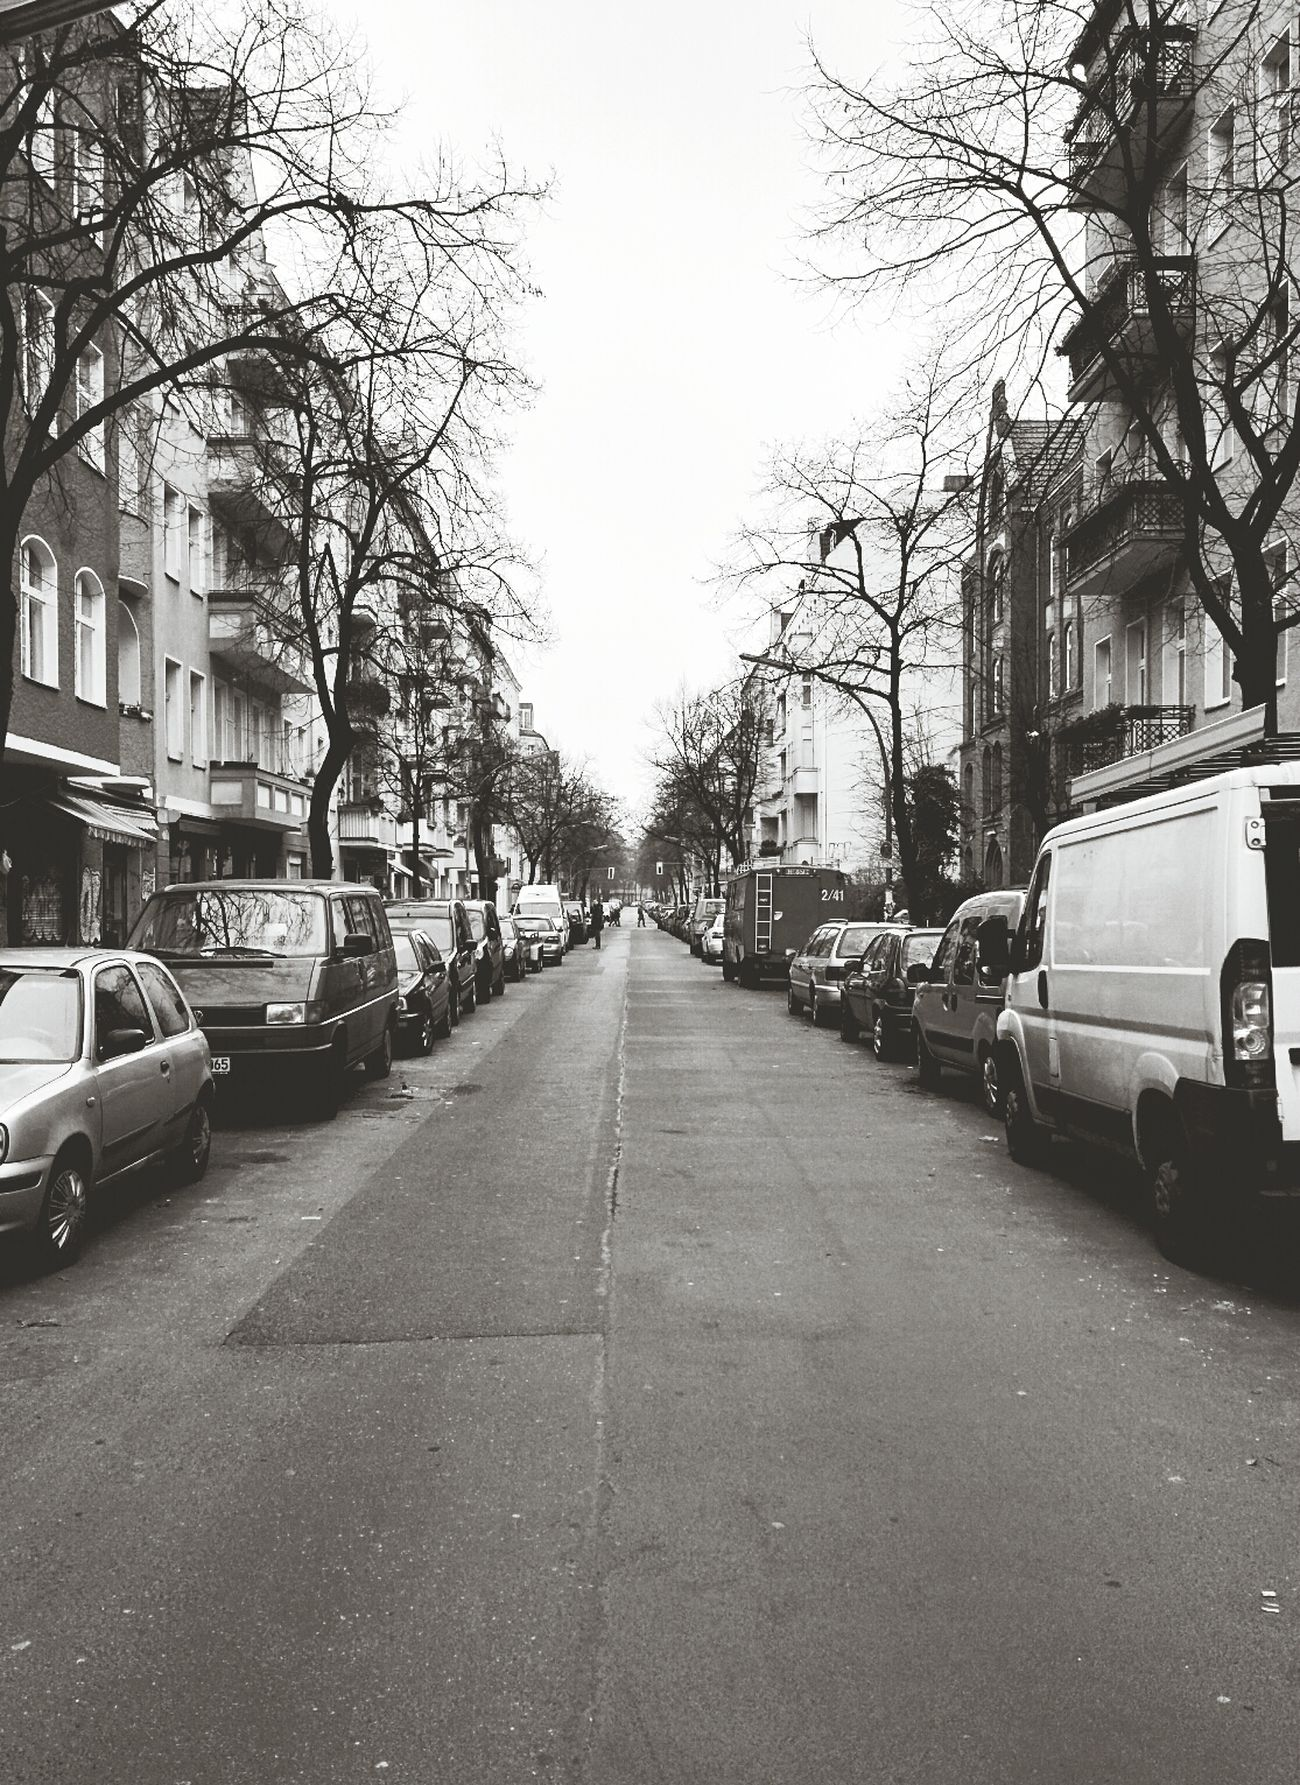 Streetphotography Blackandwhite Endless